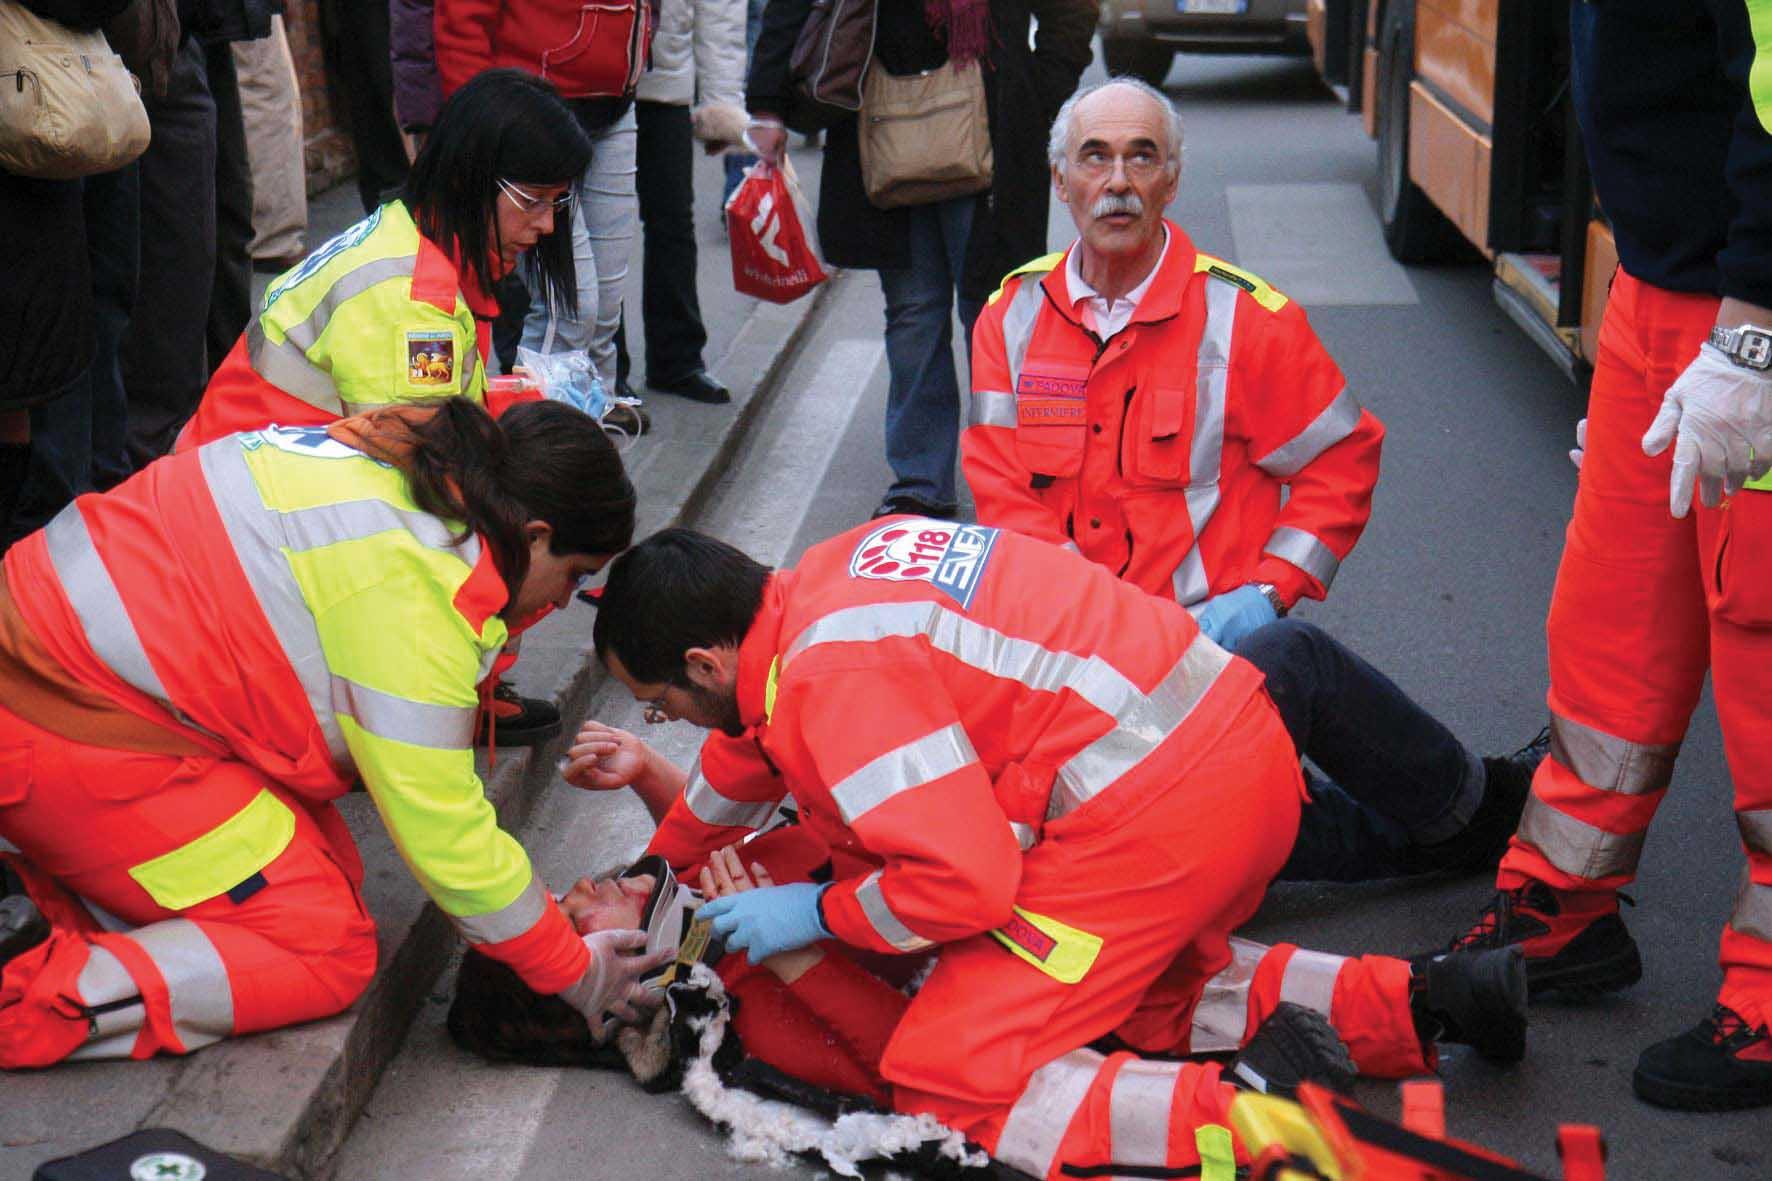 incidente stradale primo soccorso